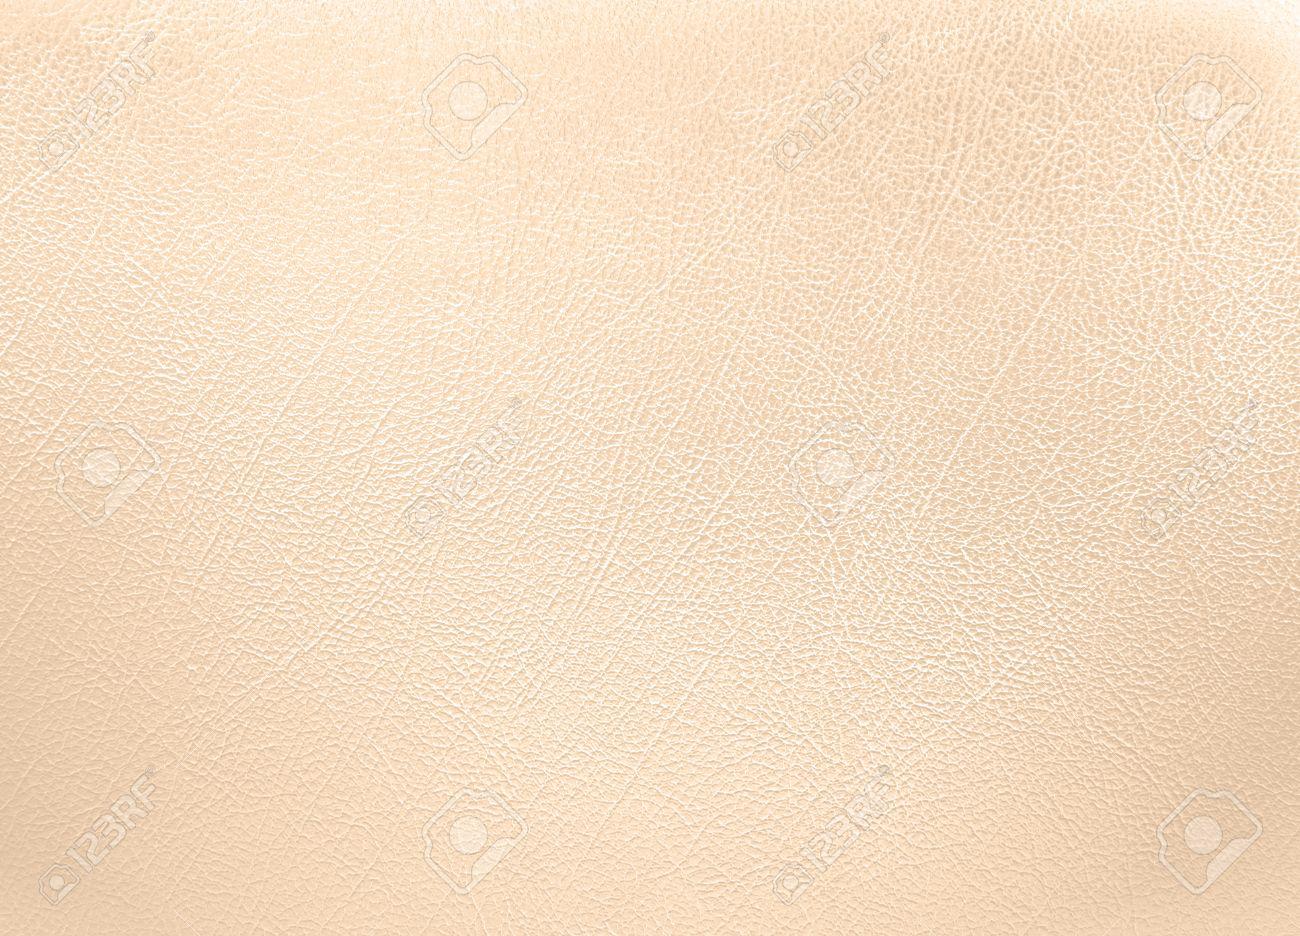 6d74c26e1aeb Cream colored leather texture background Stock Photo - 35140053